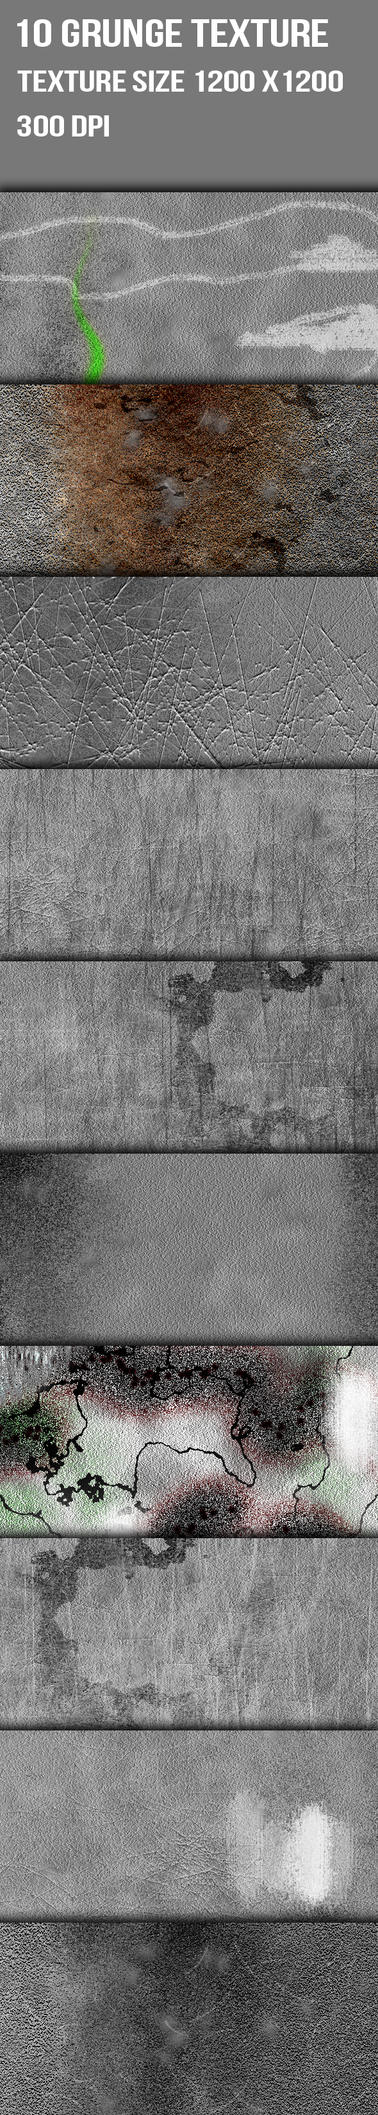 Grunge Texture by mdbulbulahmed